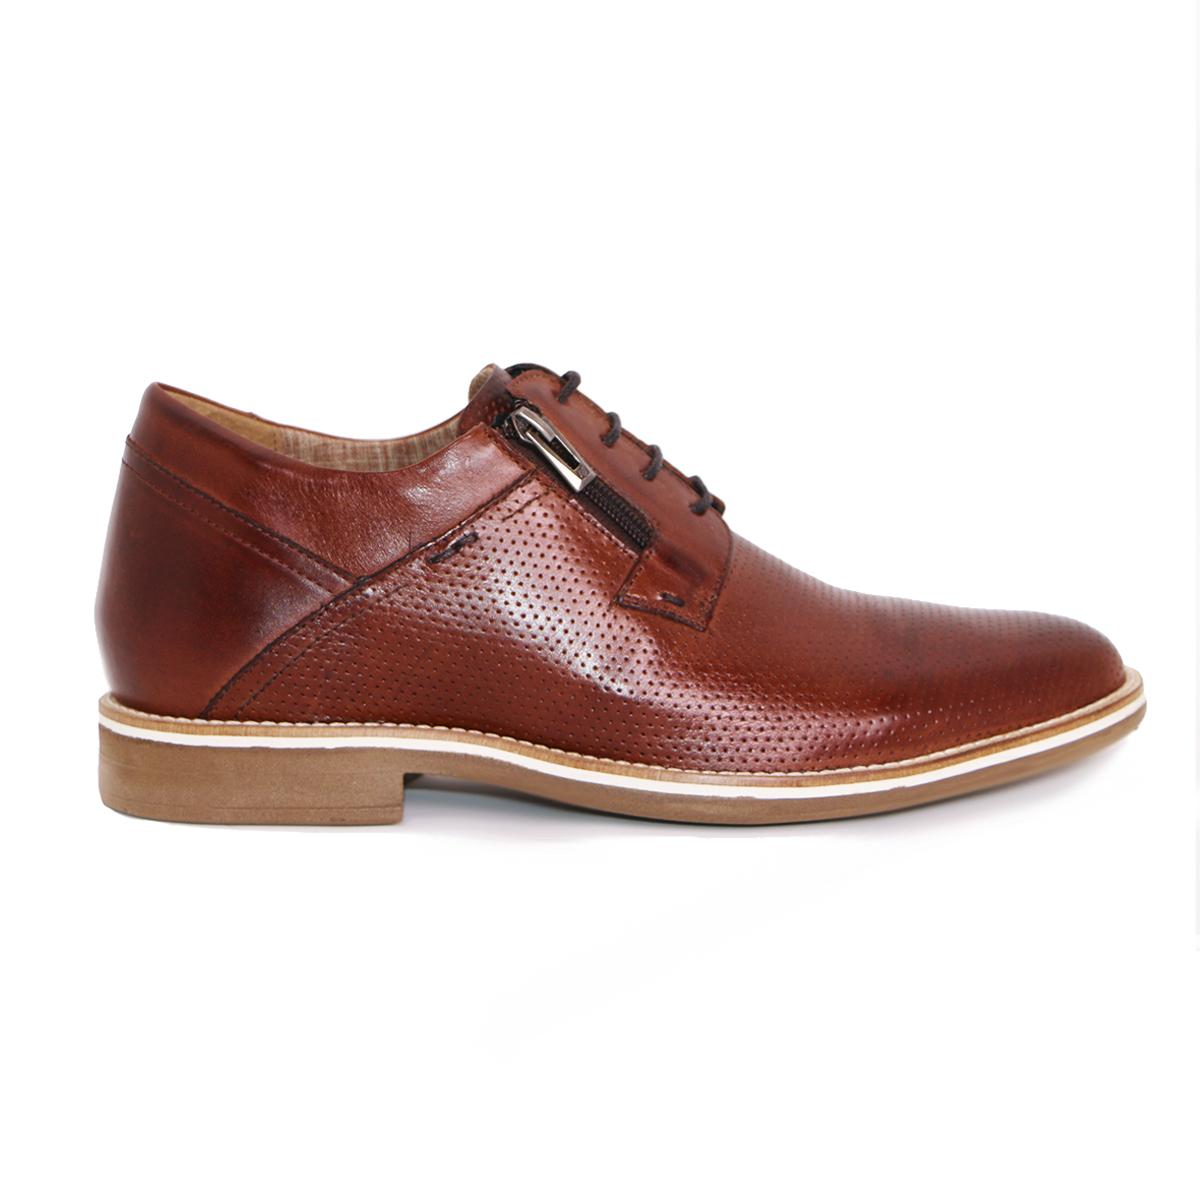 Zapato Casual Break Café Max Denegri +7cms De Altura_72699